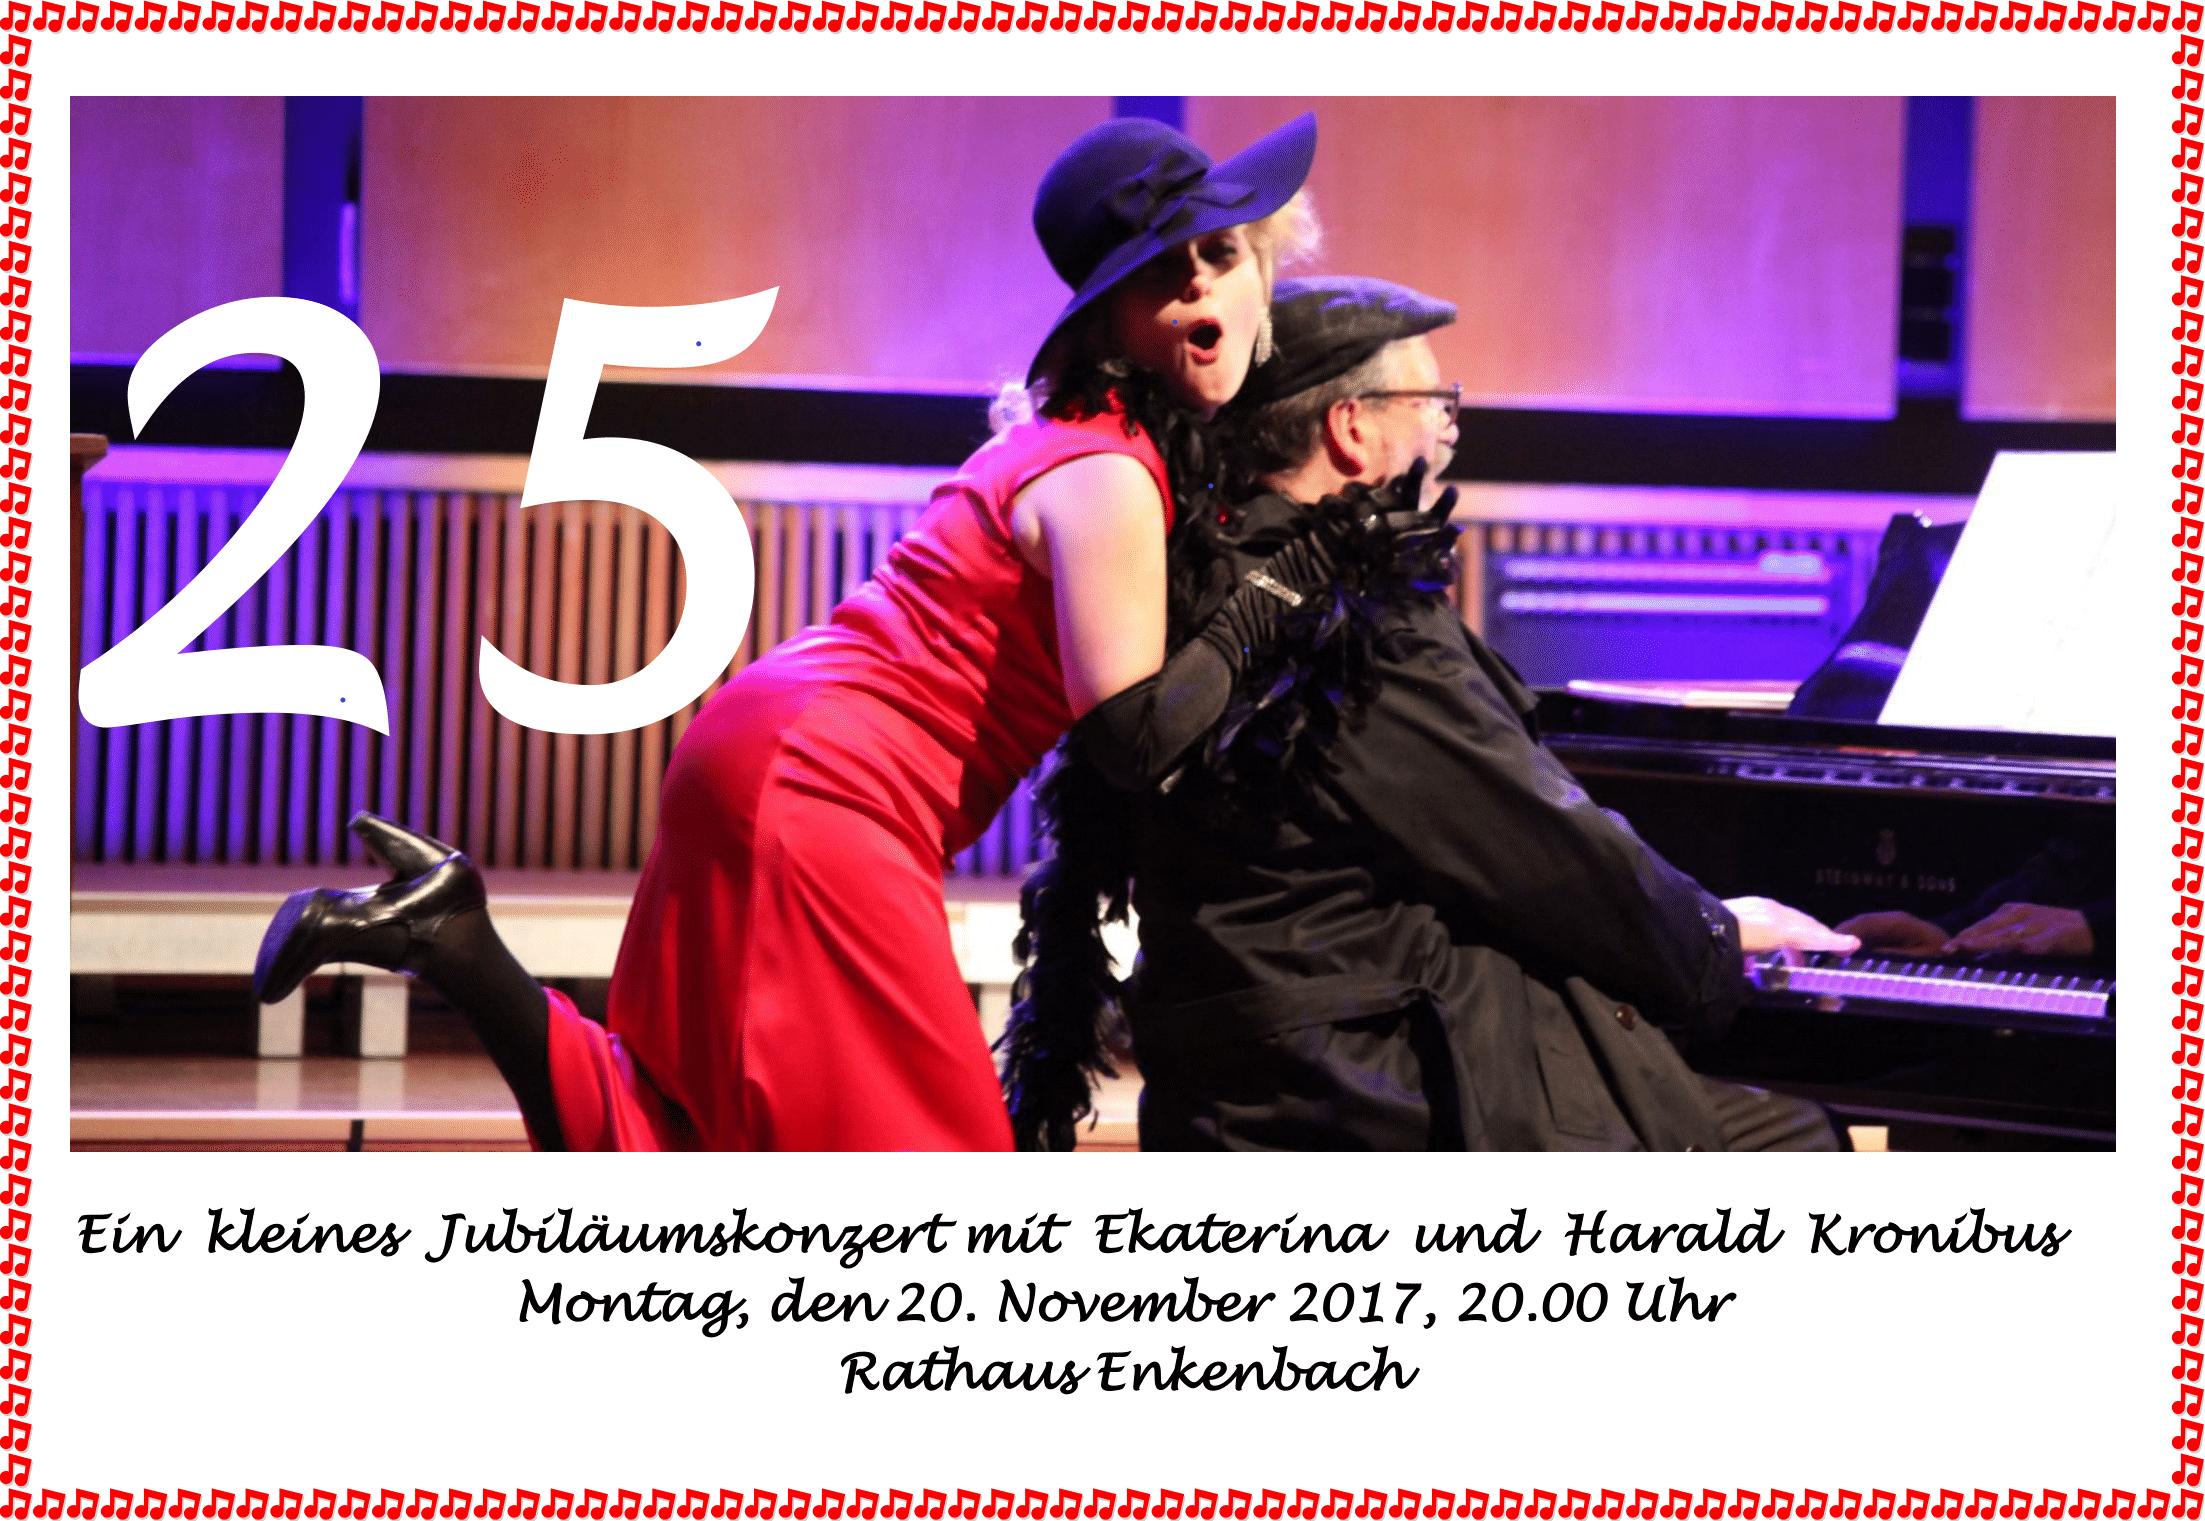 Plakat Ratskonzert mit Ekaterina und Harald Kronibus